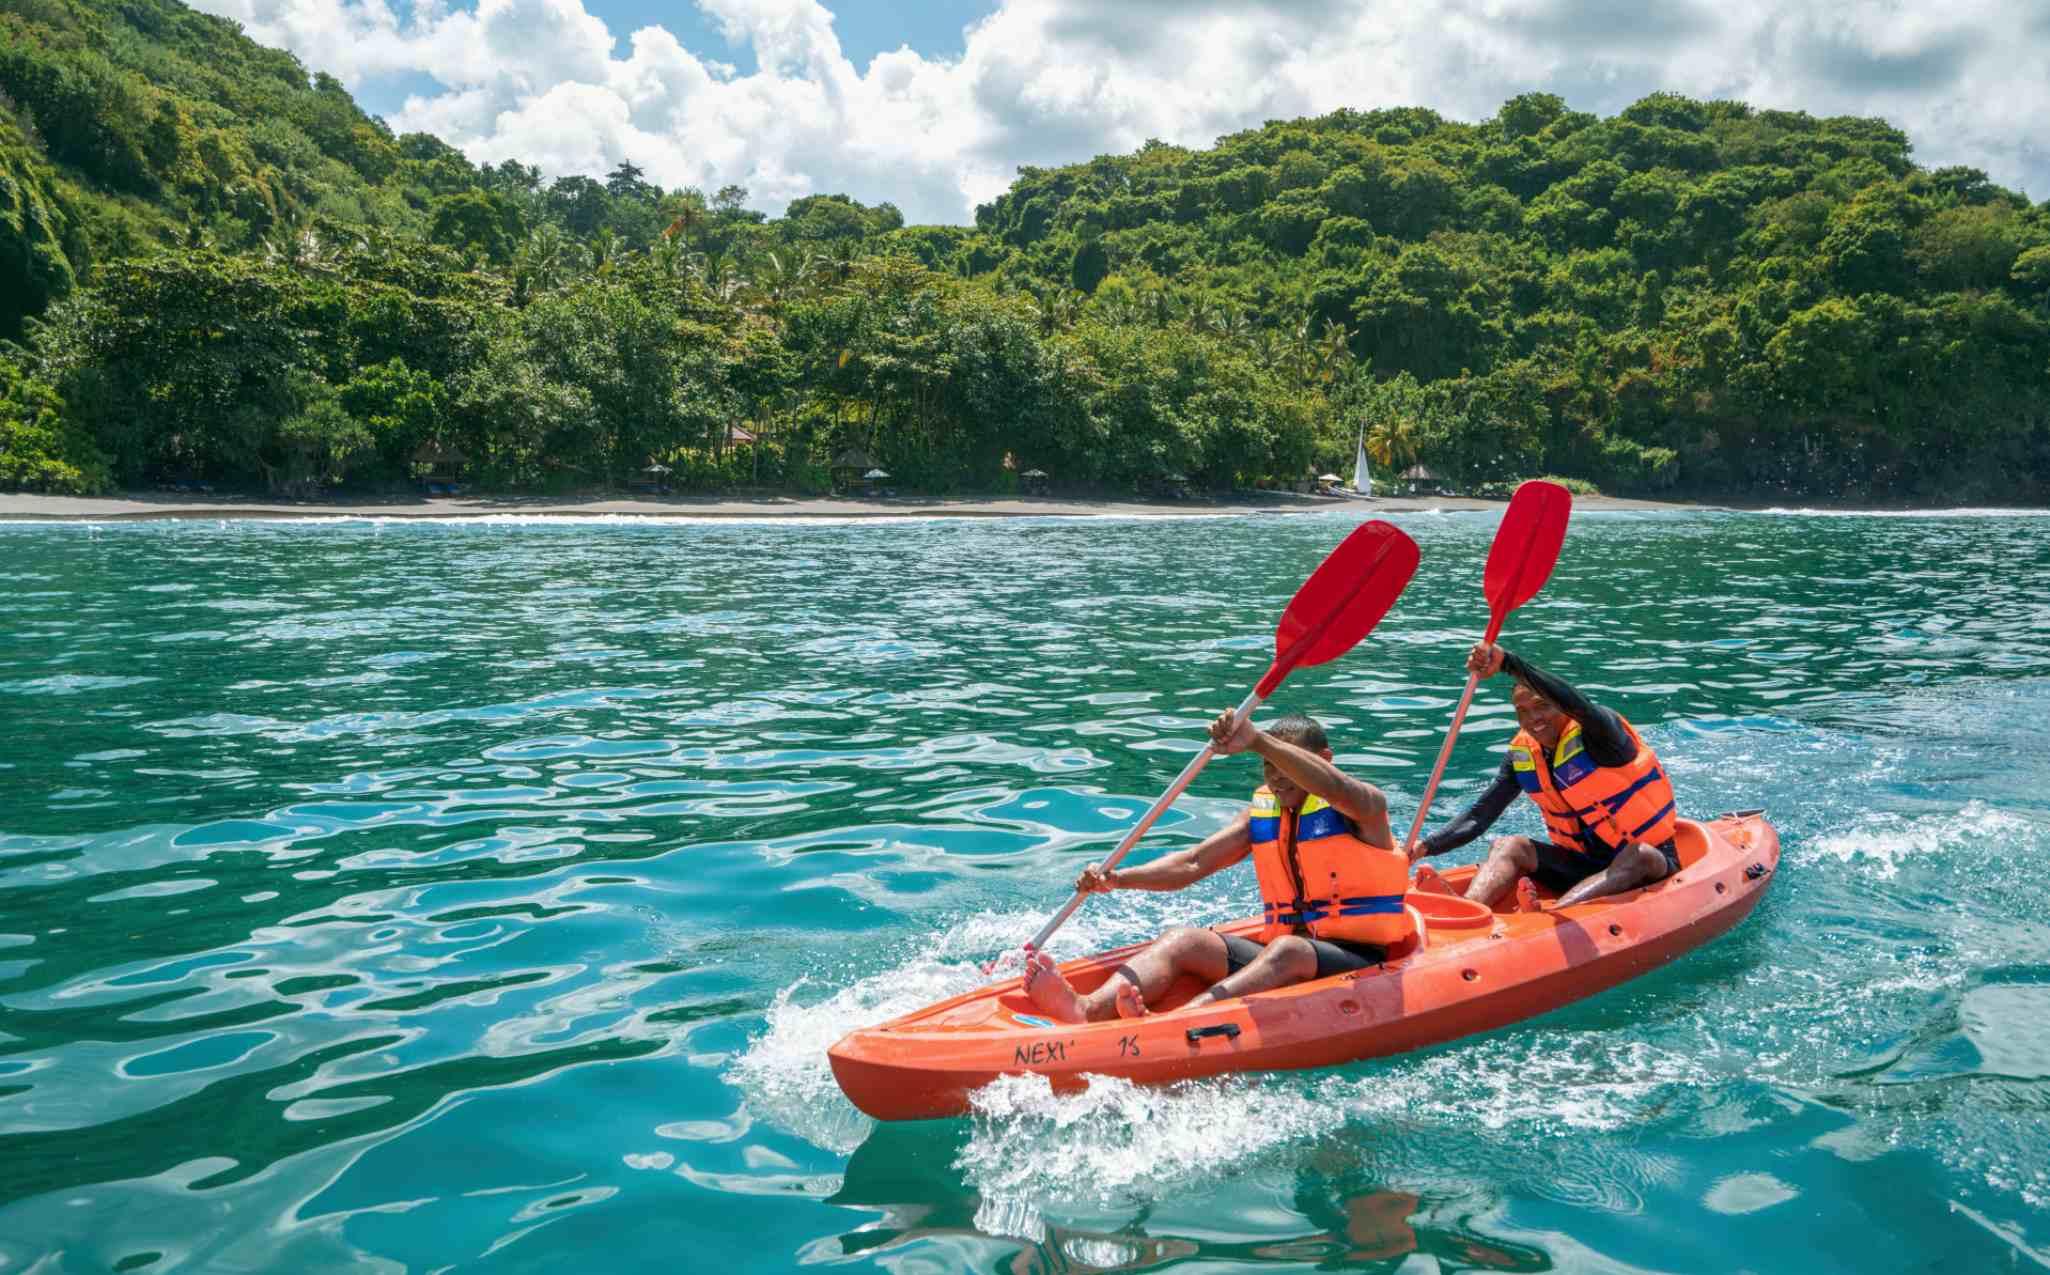 East Bali Rafting